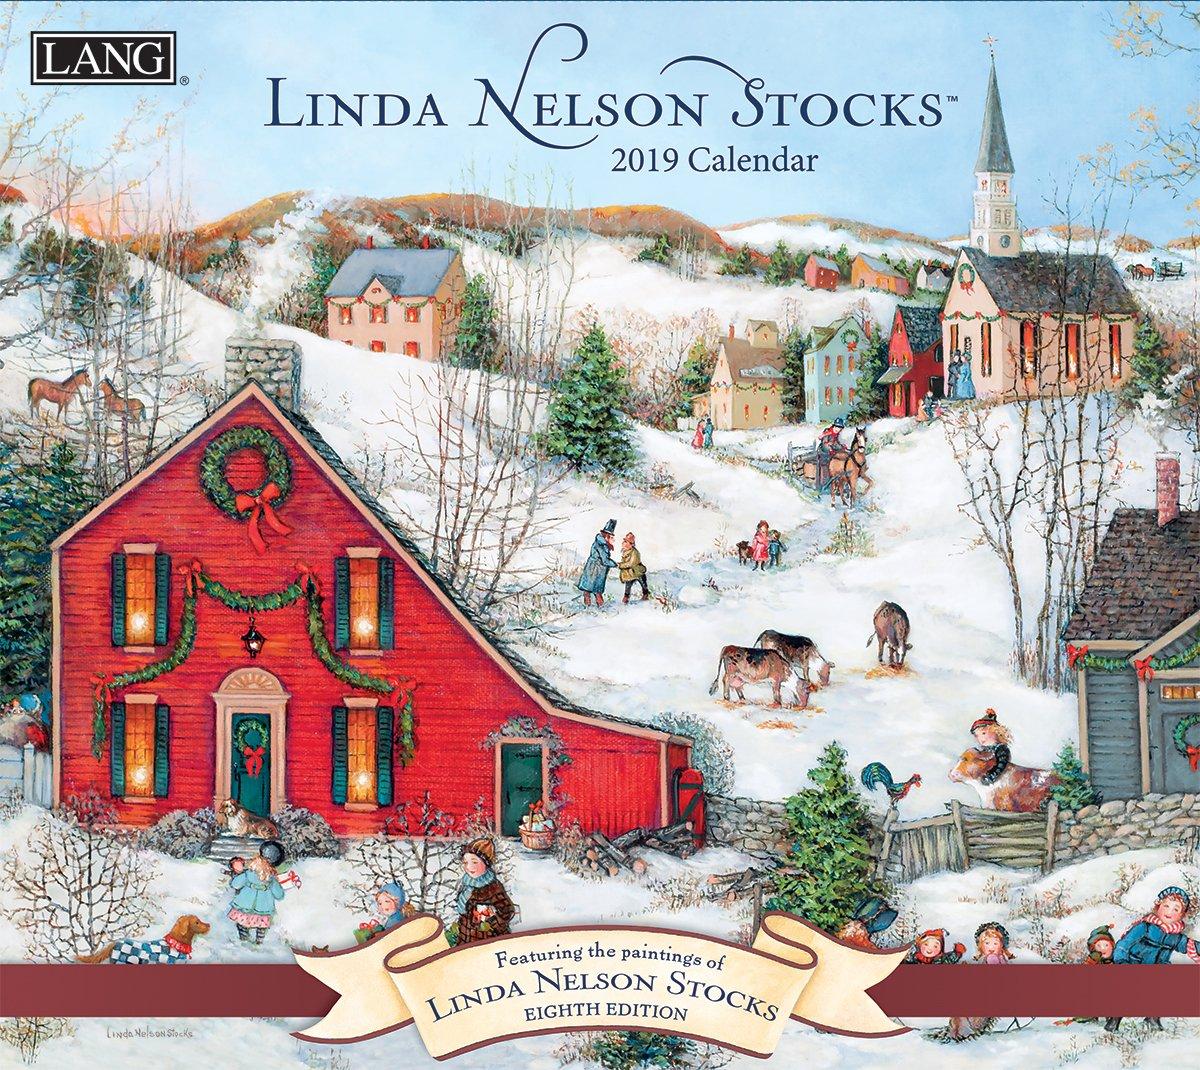 The Lang Companies Linda Nelson Stocks 2019 Wall Calendar (19991001924) by The LANG Companies (Image #1)